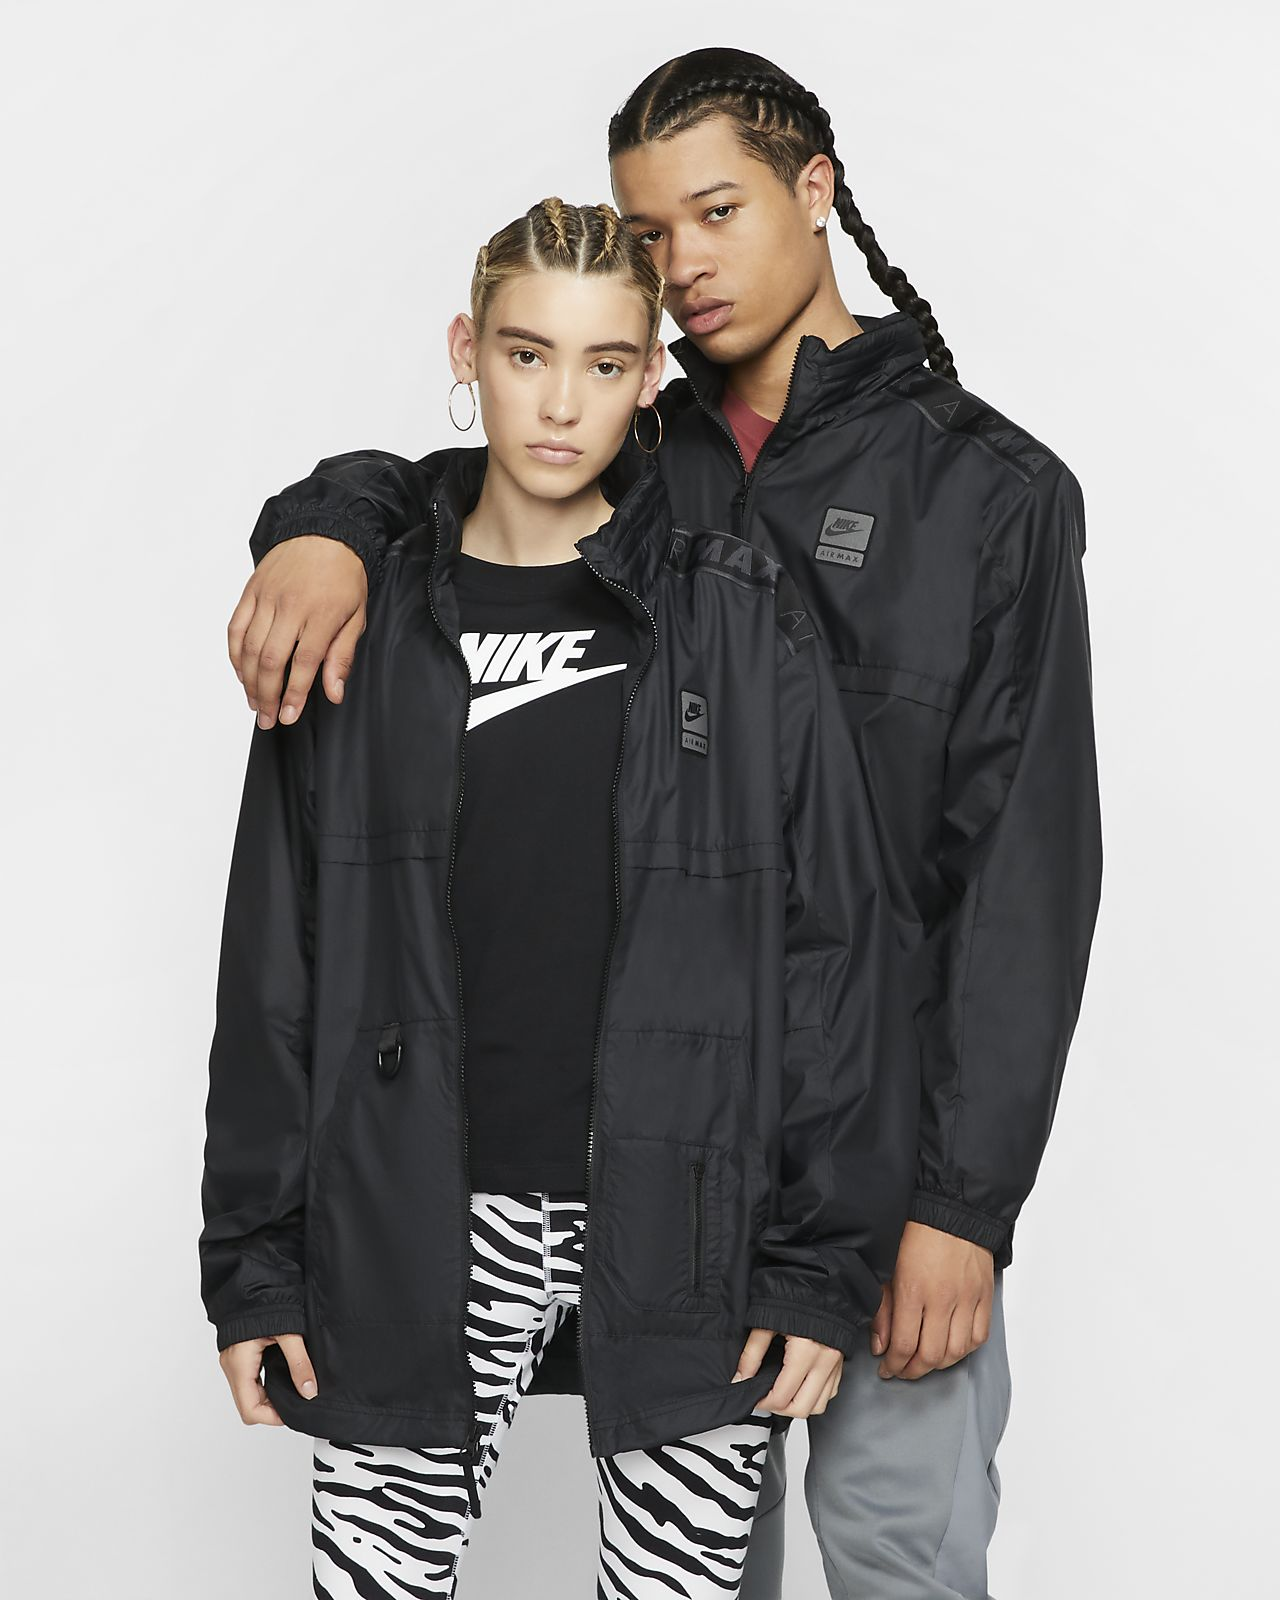 Veste tissée Nike Sportswear Air Max